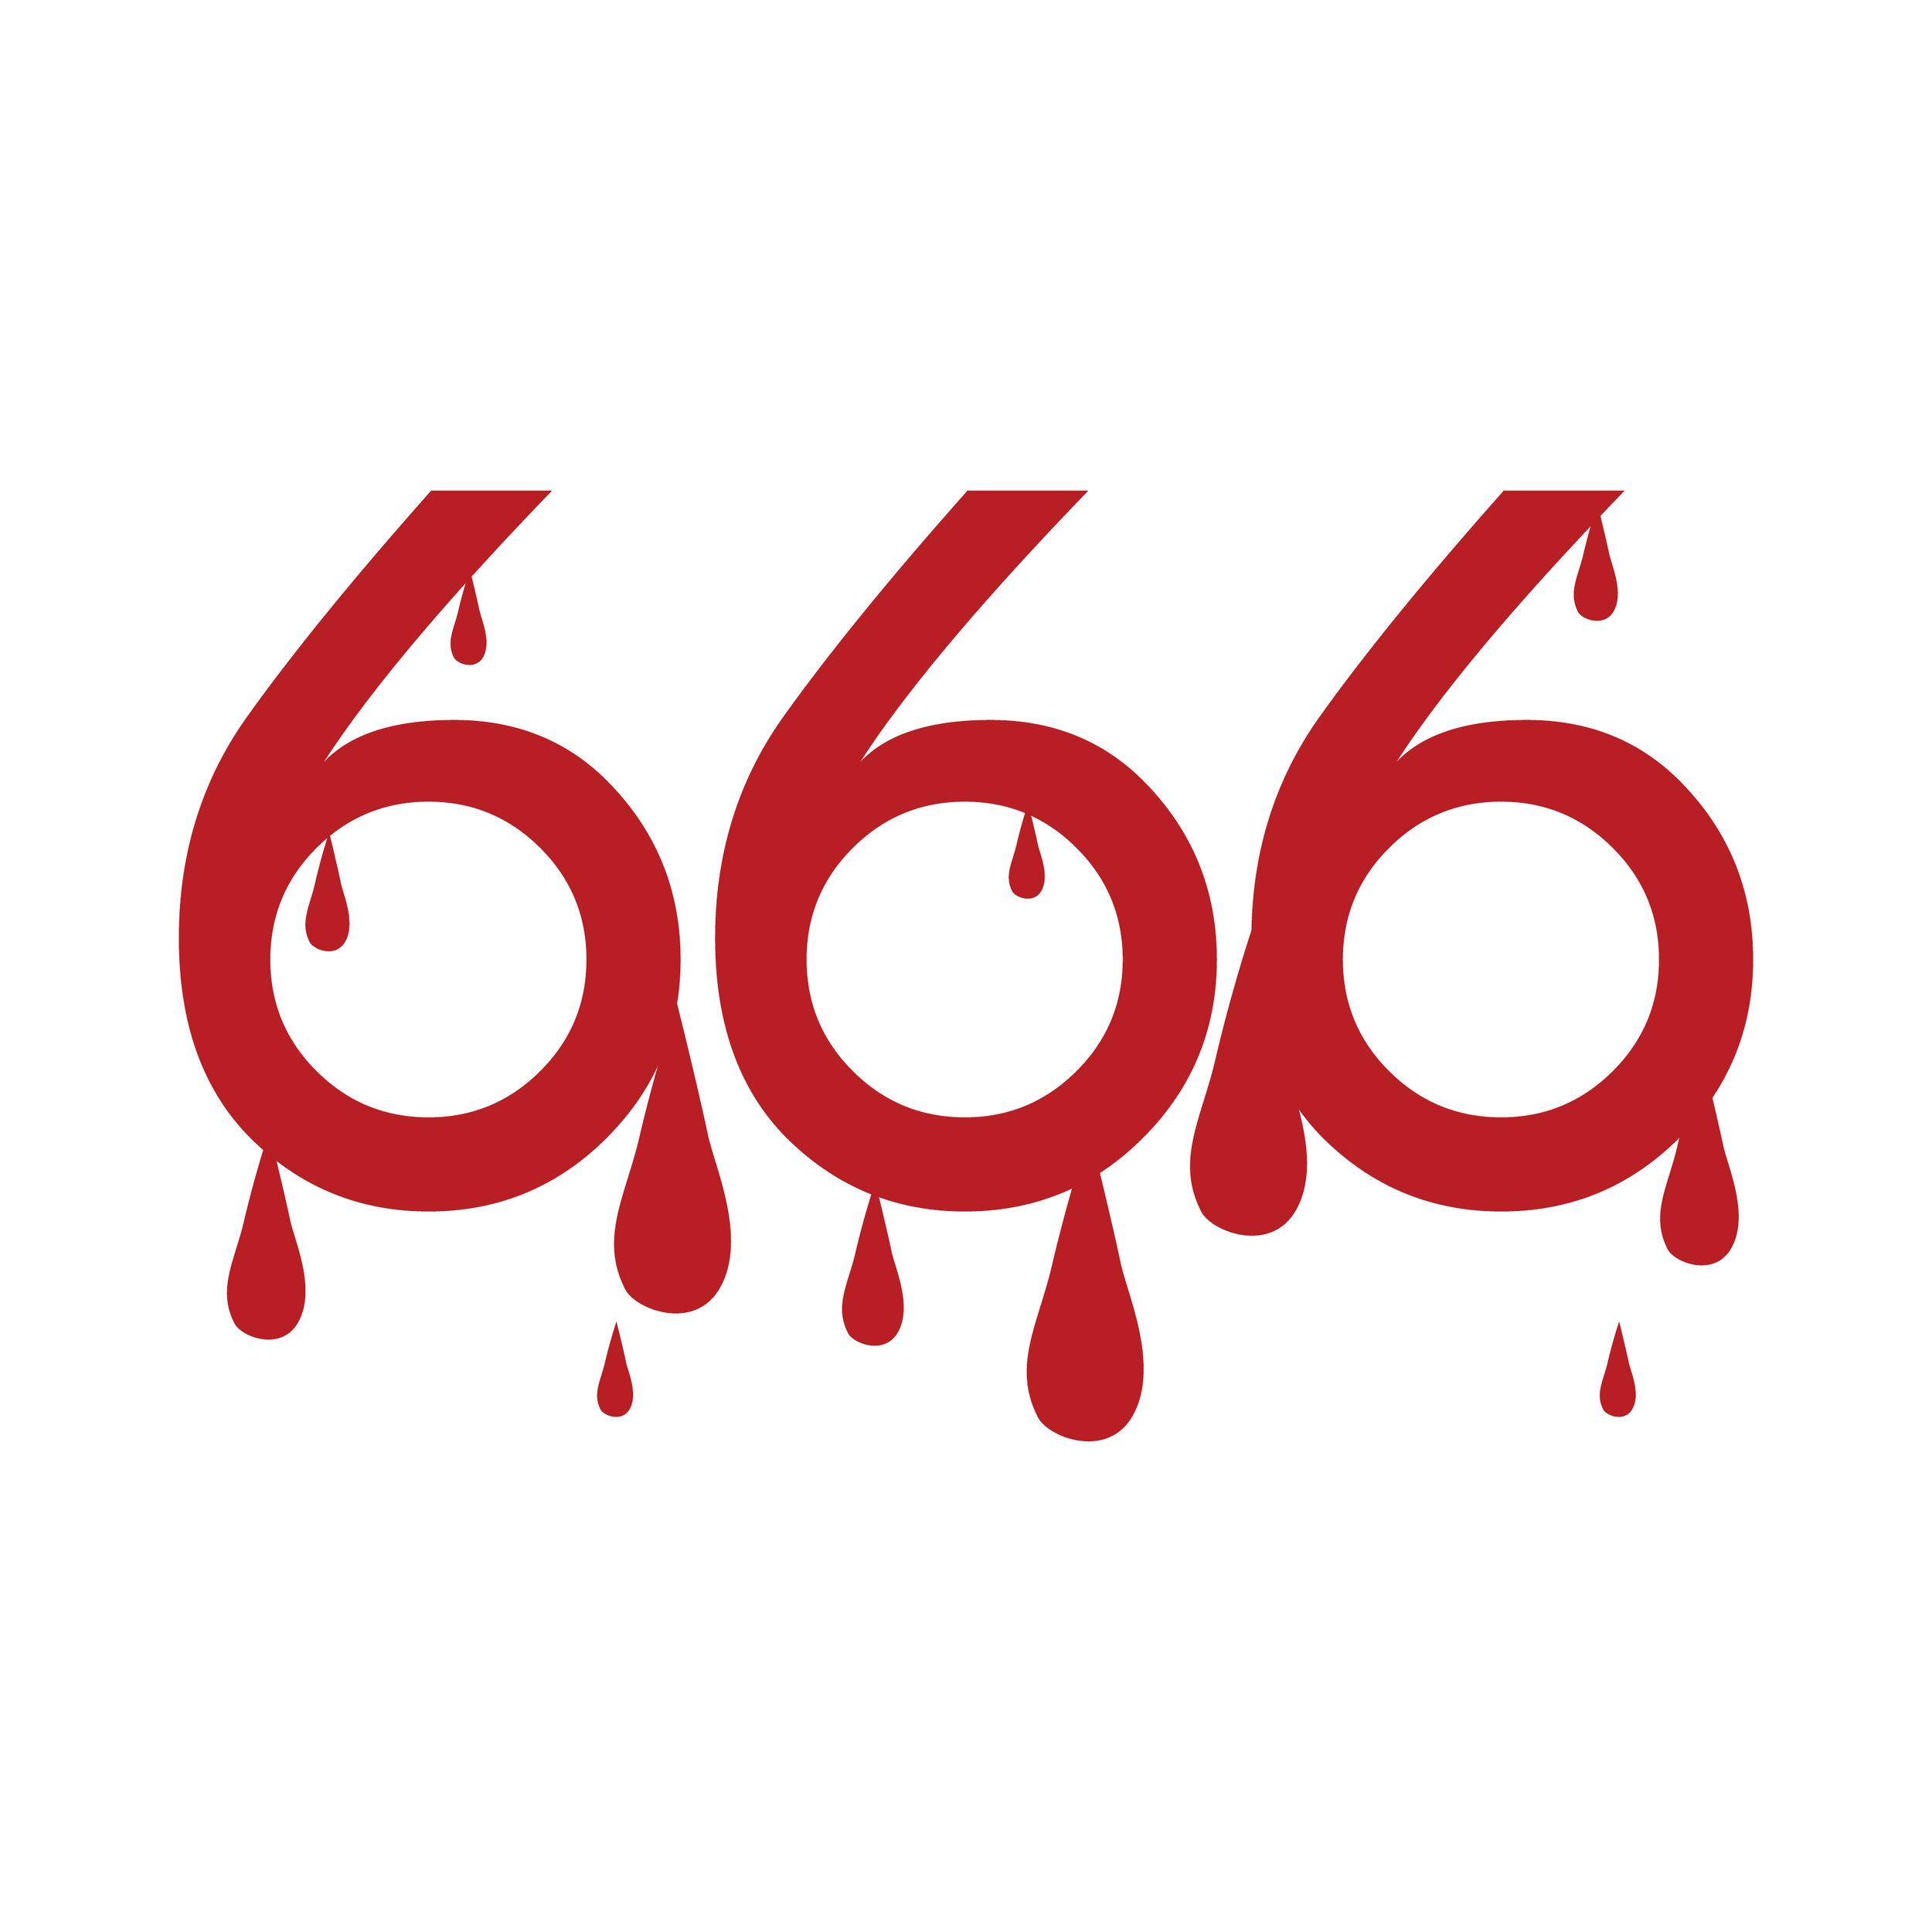 6 is for the devil.jpg